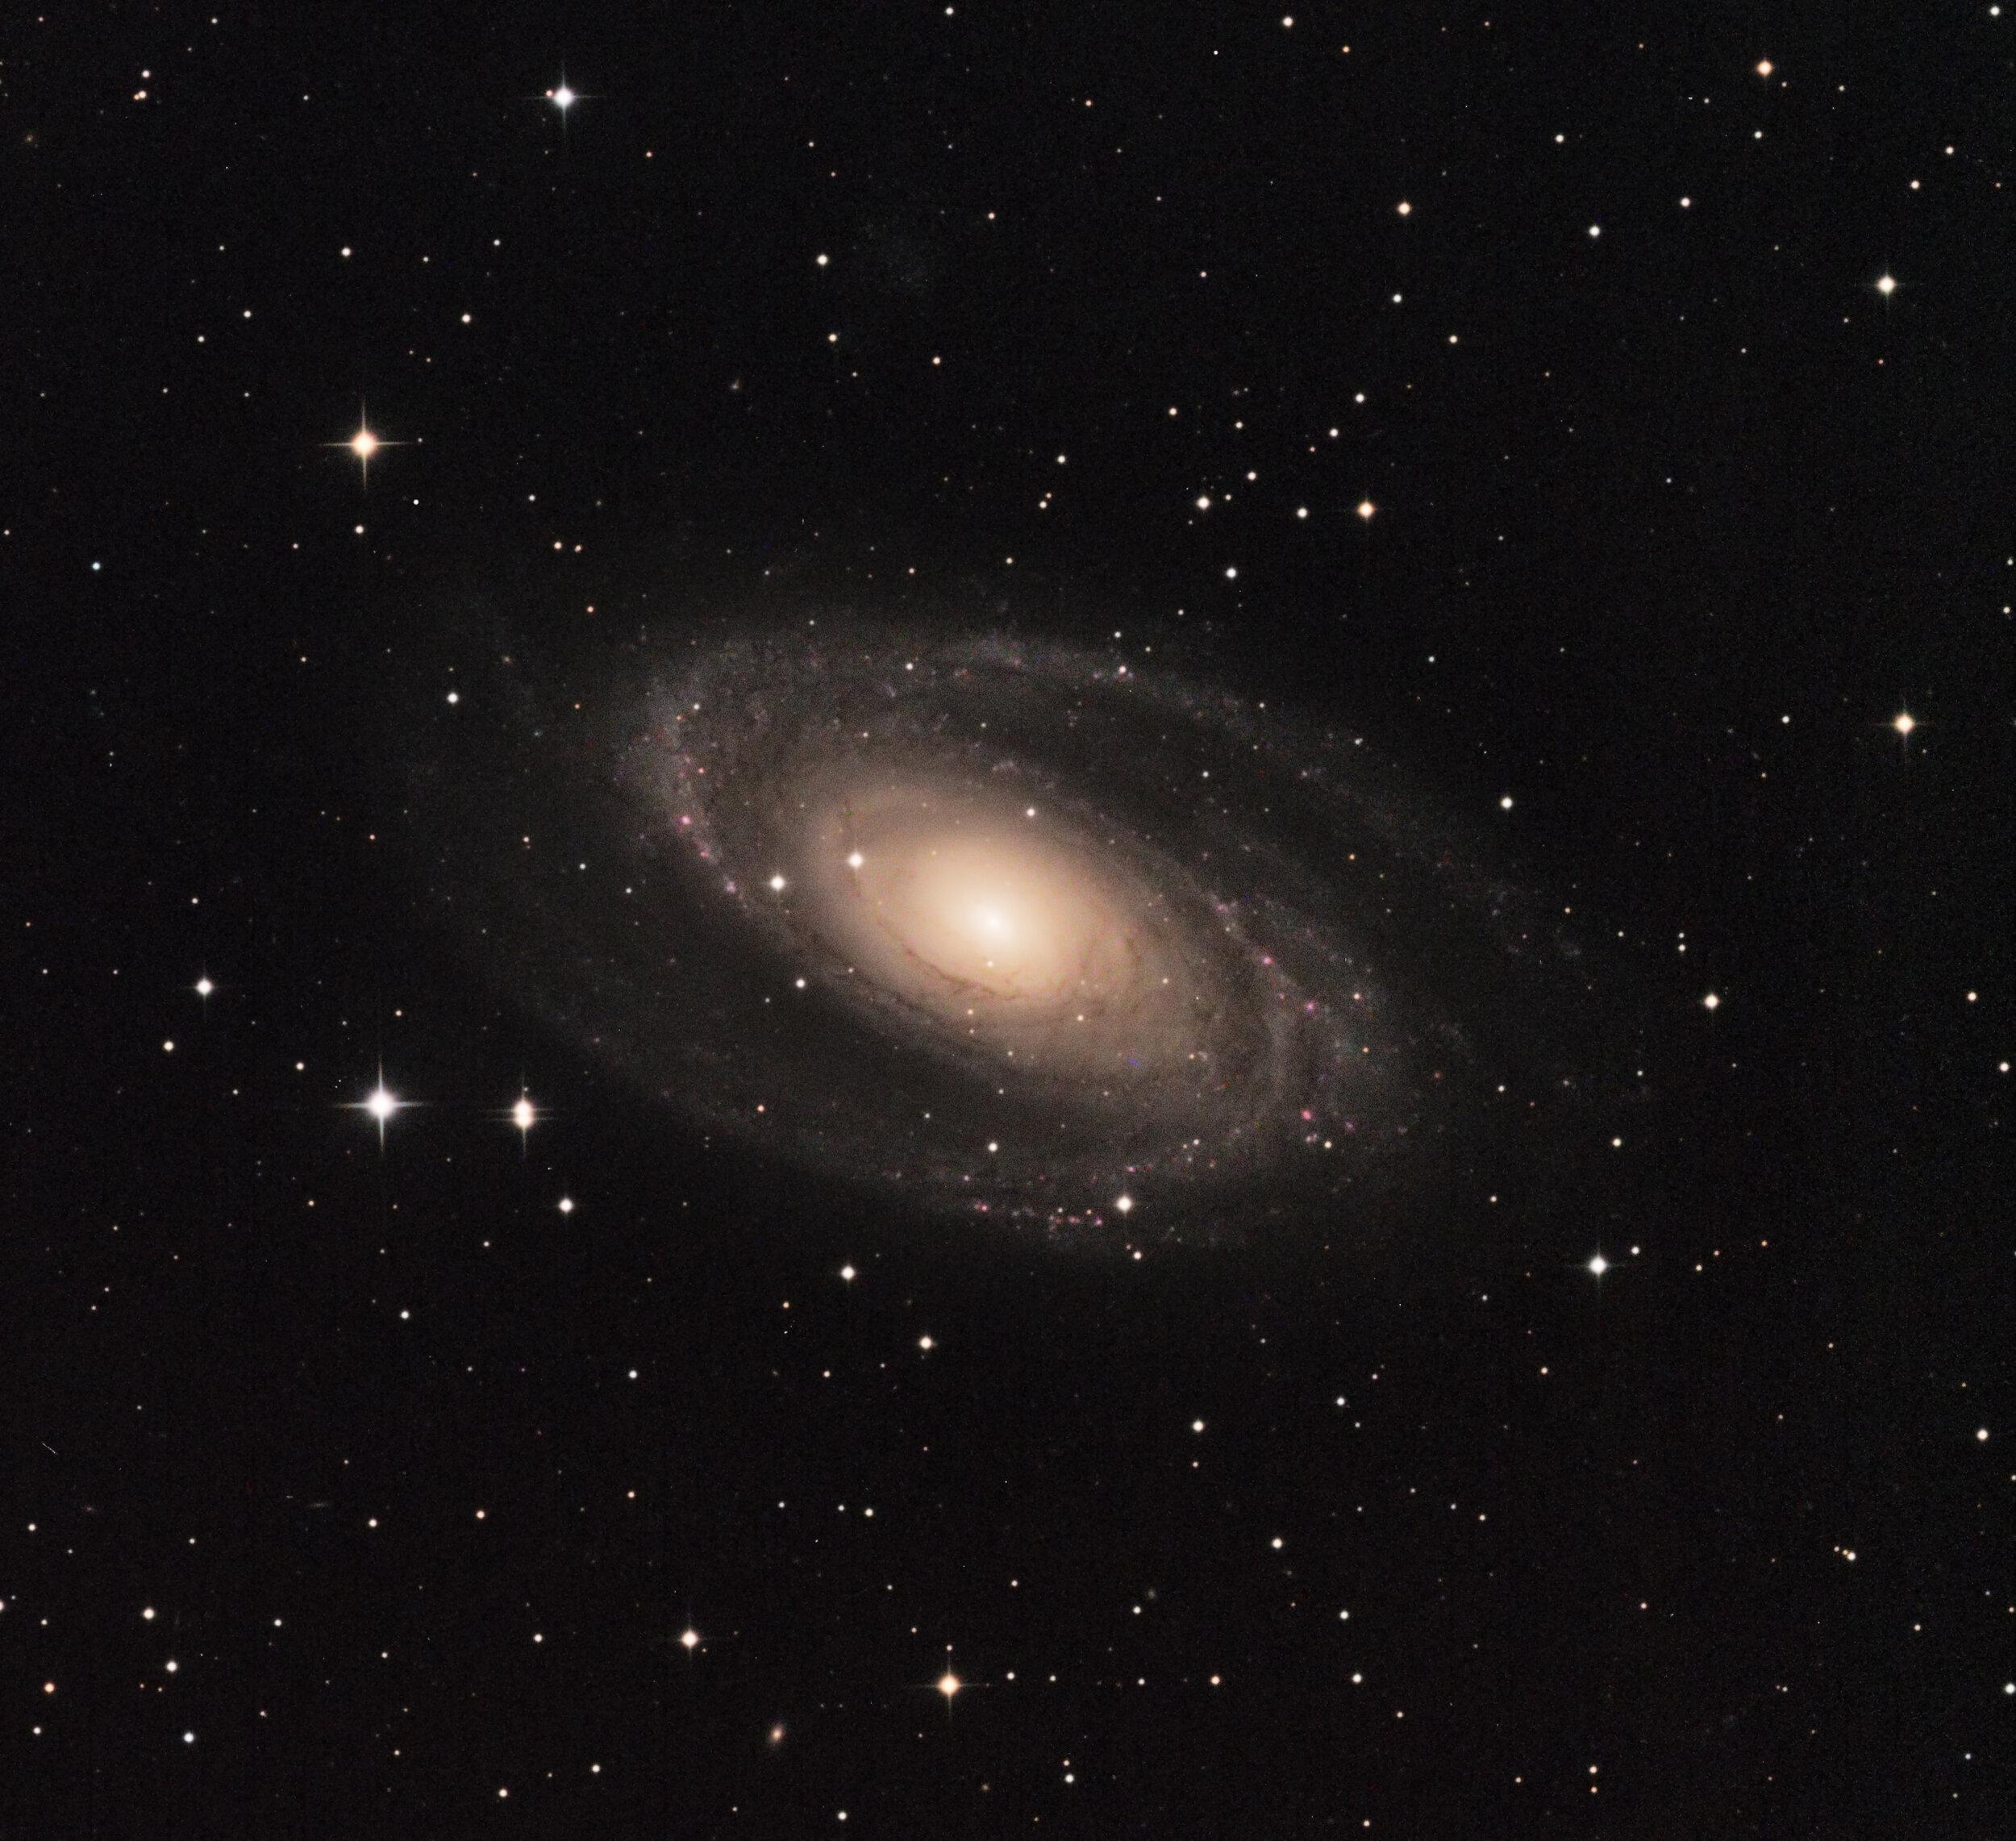 M81 Bode's Galaxy